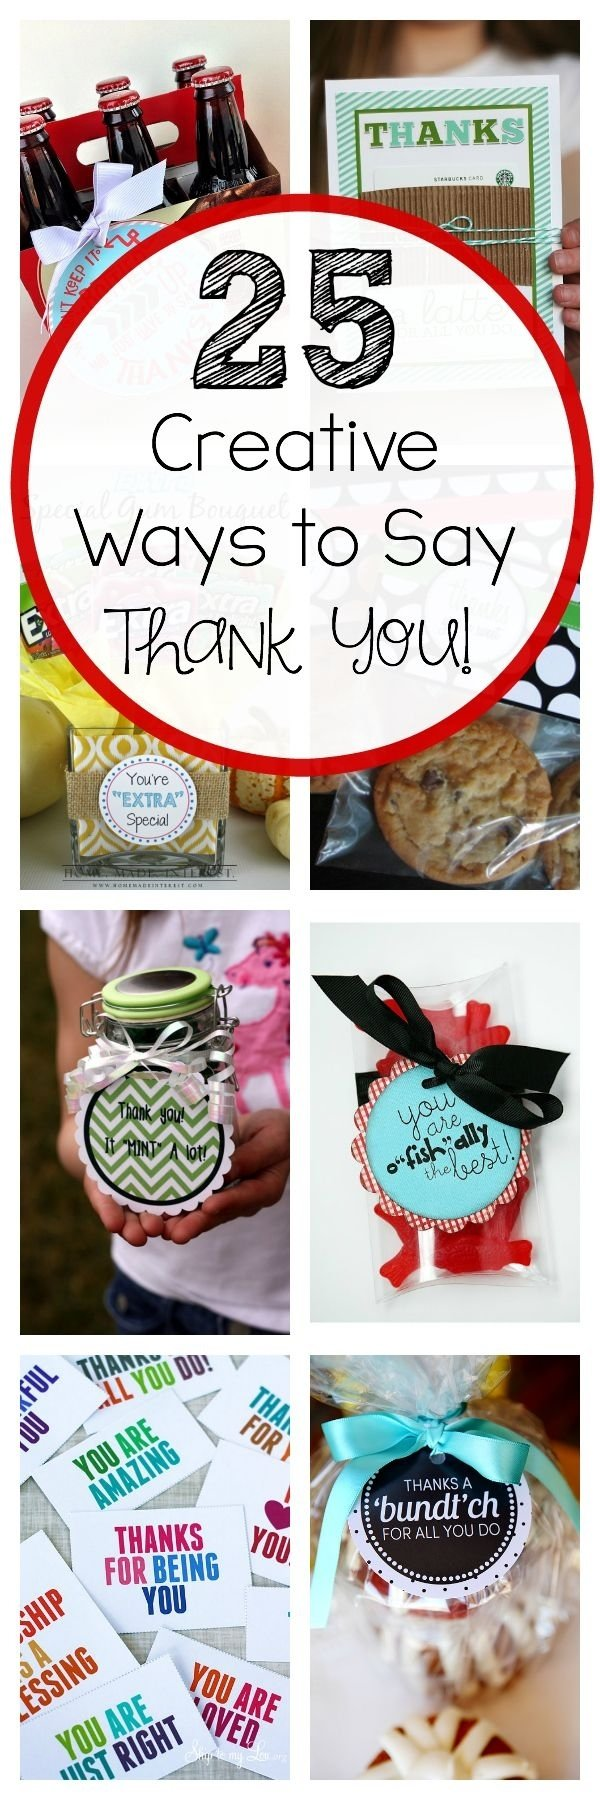 103 best thank you gift ideas images on pinterest | teacher